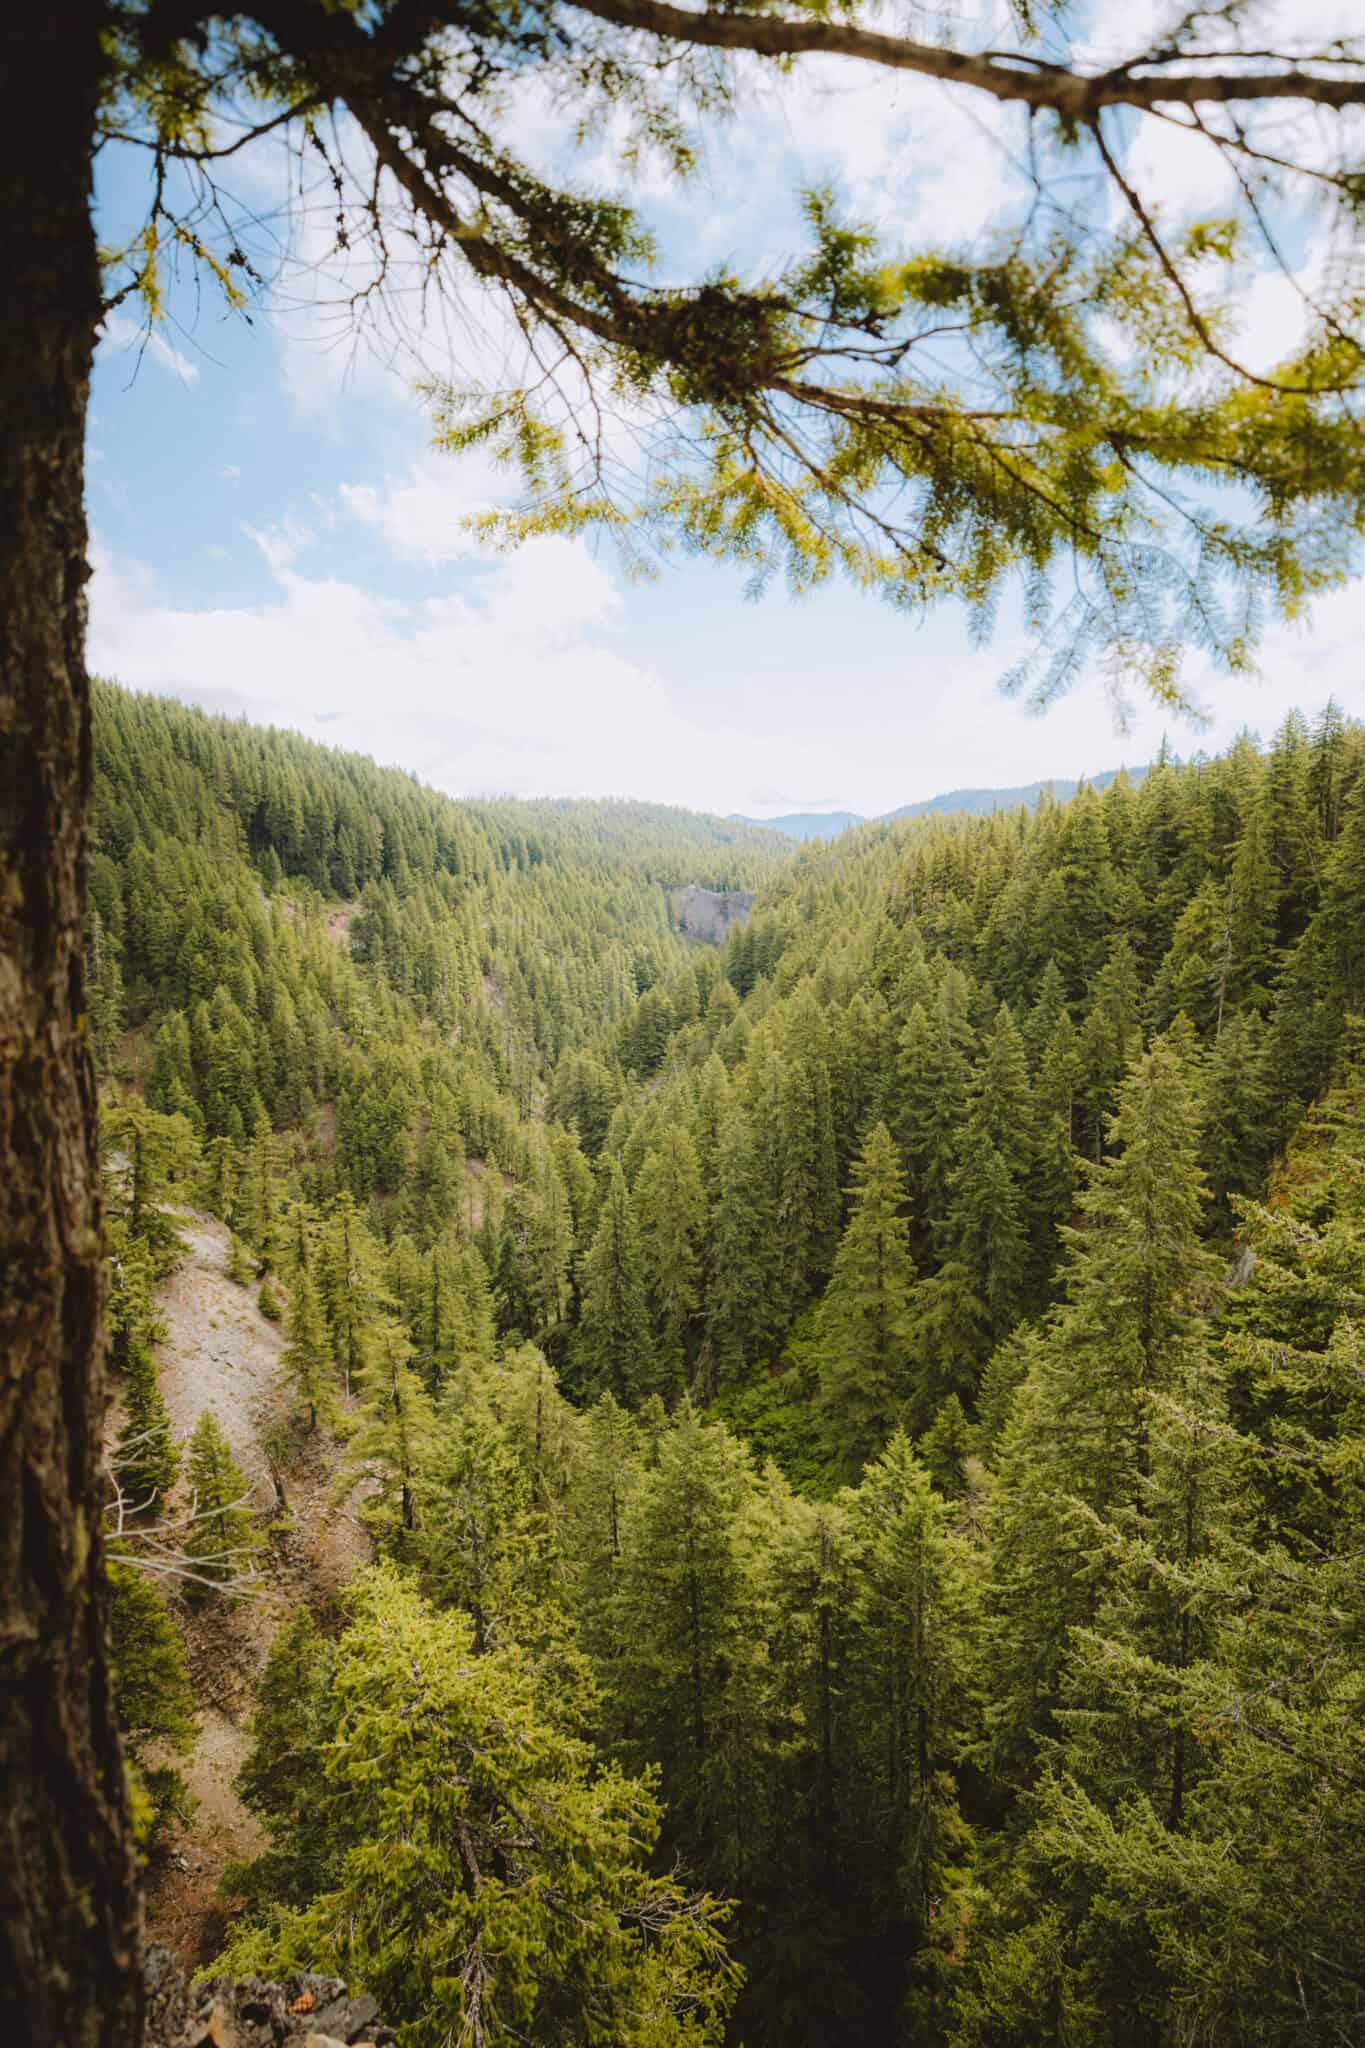 View of Salt Creek Falls Gorge